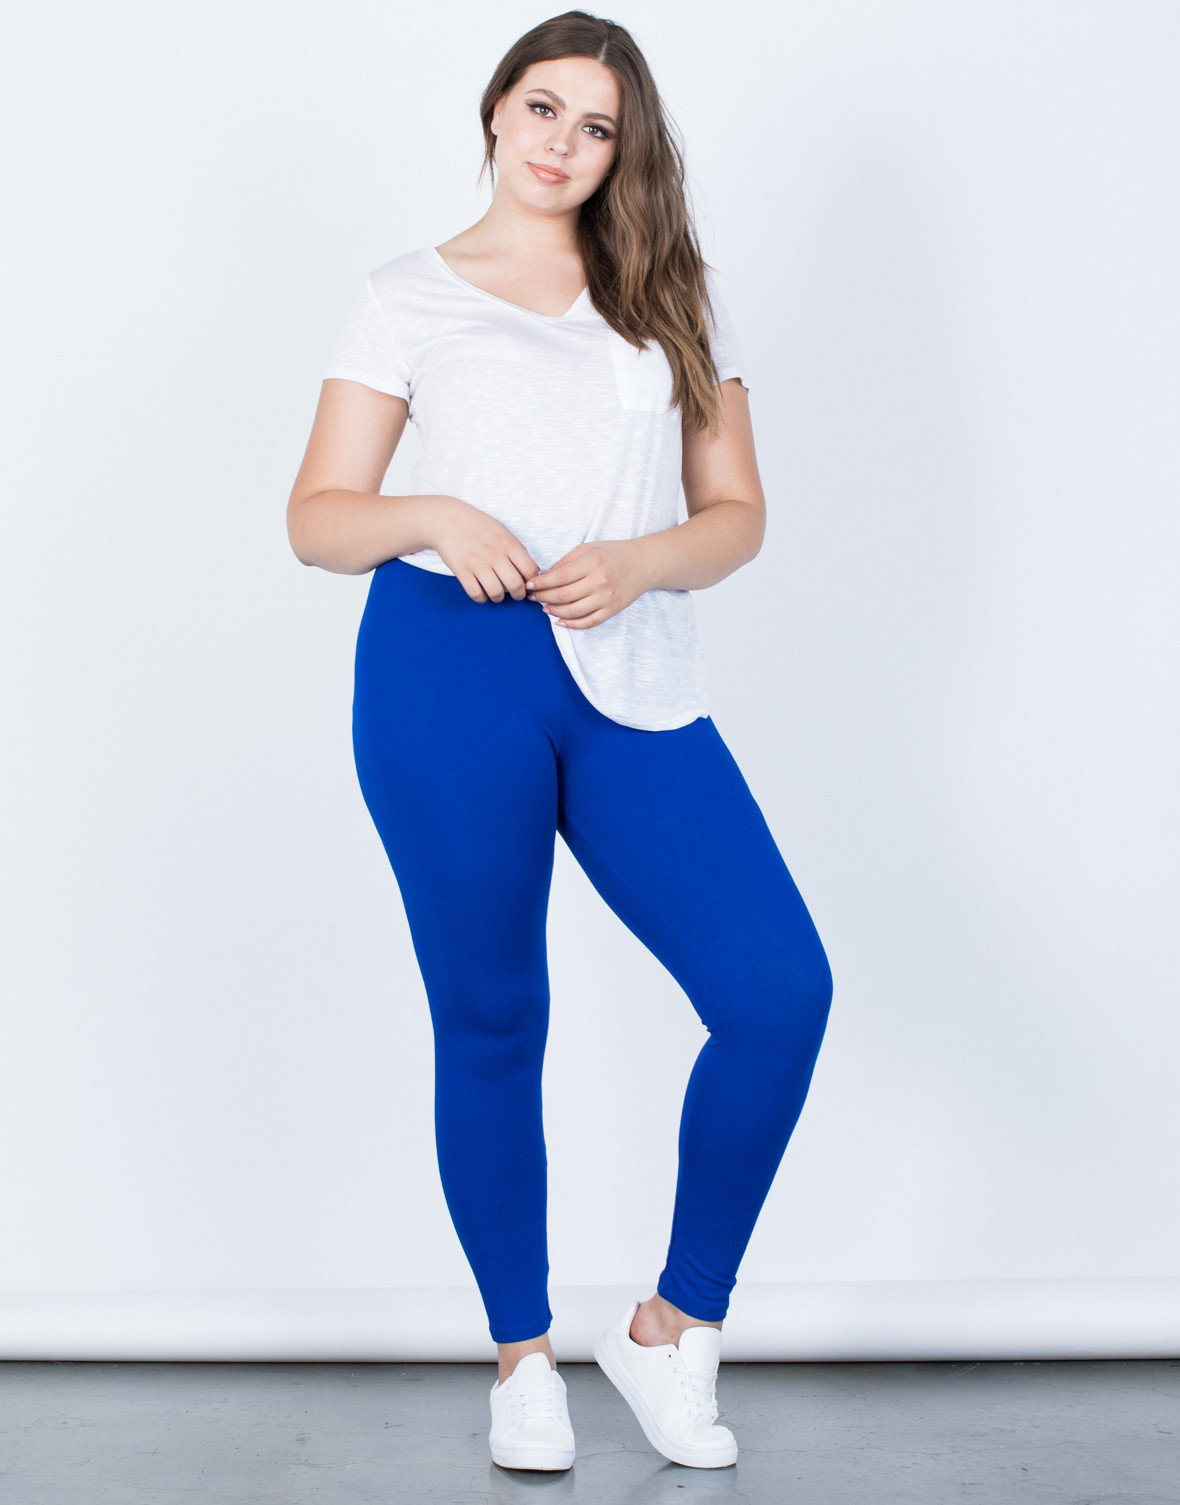 plus size leggings ... royal blue plus size on the go leggings - front view ... XOCGHGK